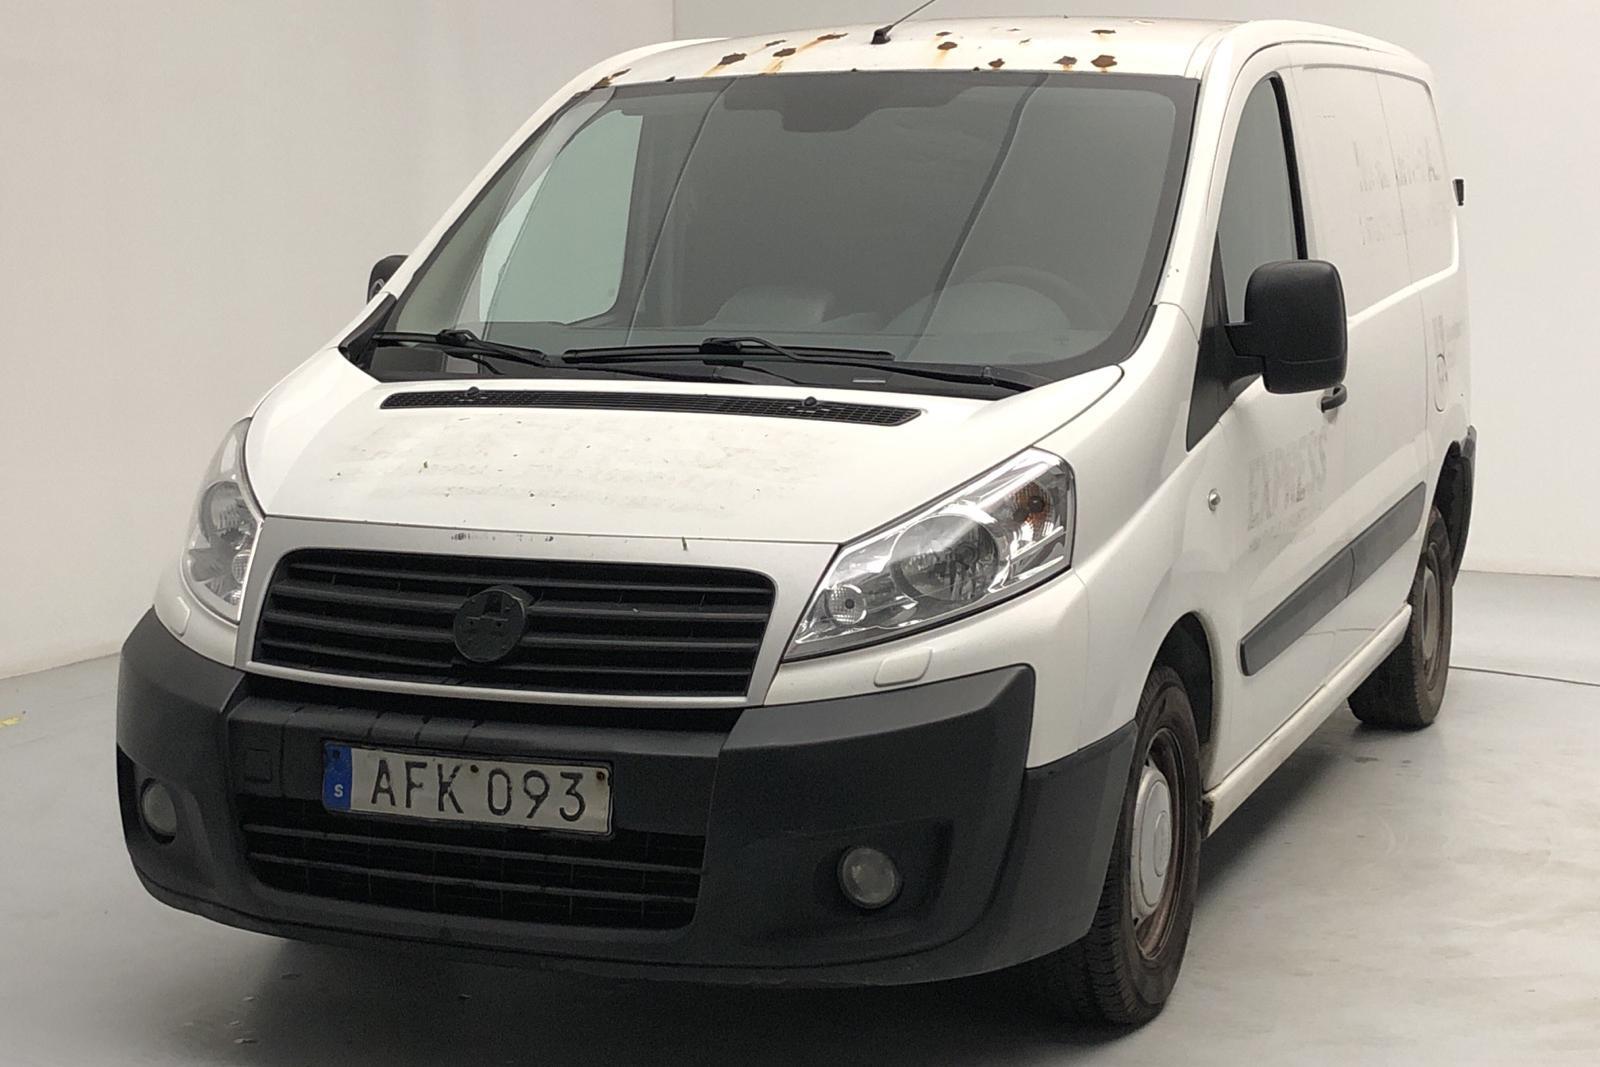 Fiat Scudo 1.6 MJT (90hk) - 349 180 km - Manual - white - 2014